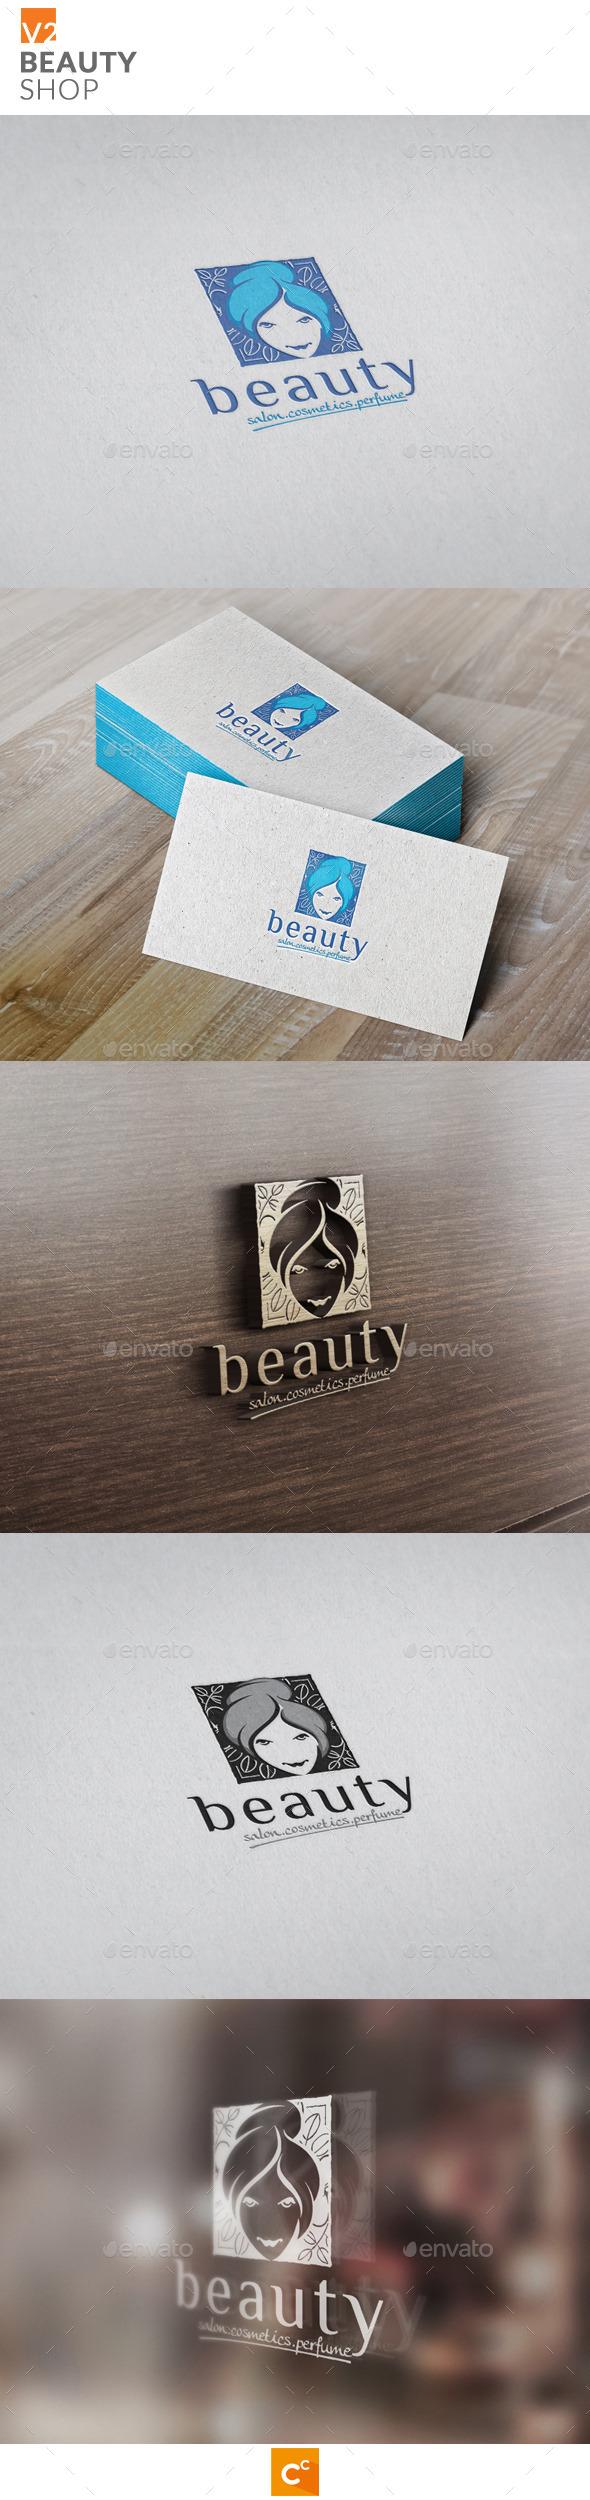 Beauty Shop v2 - Humans Logo Templates